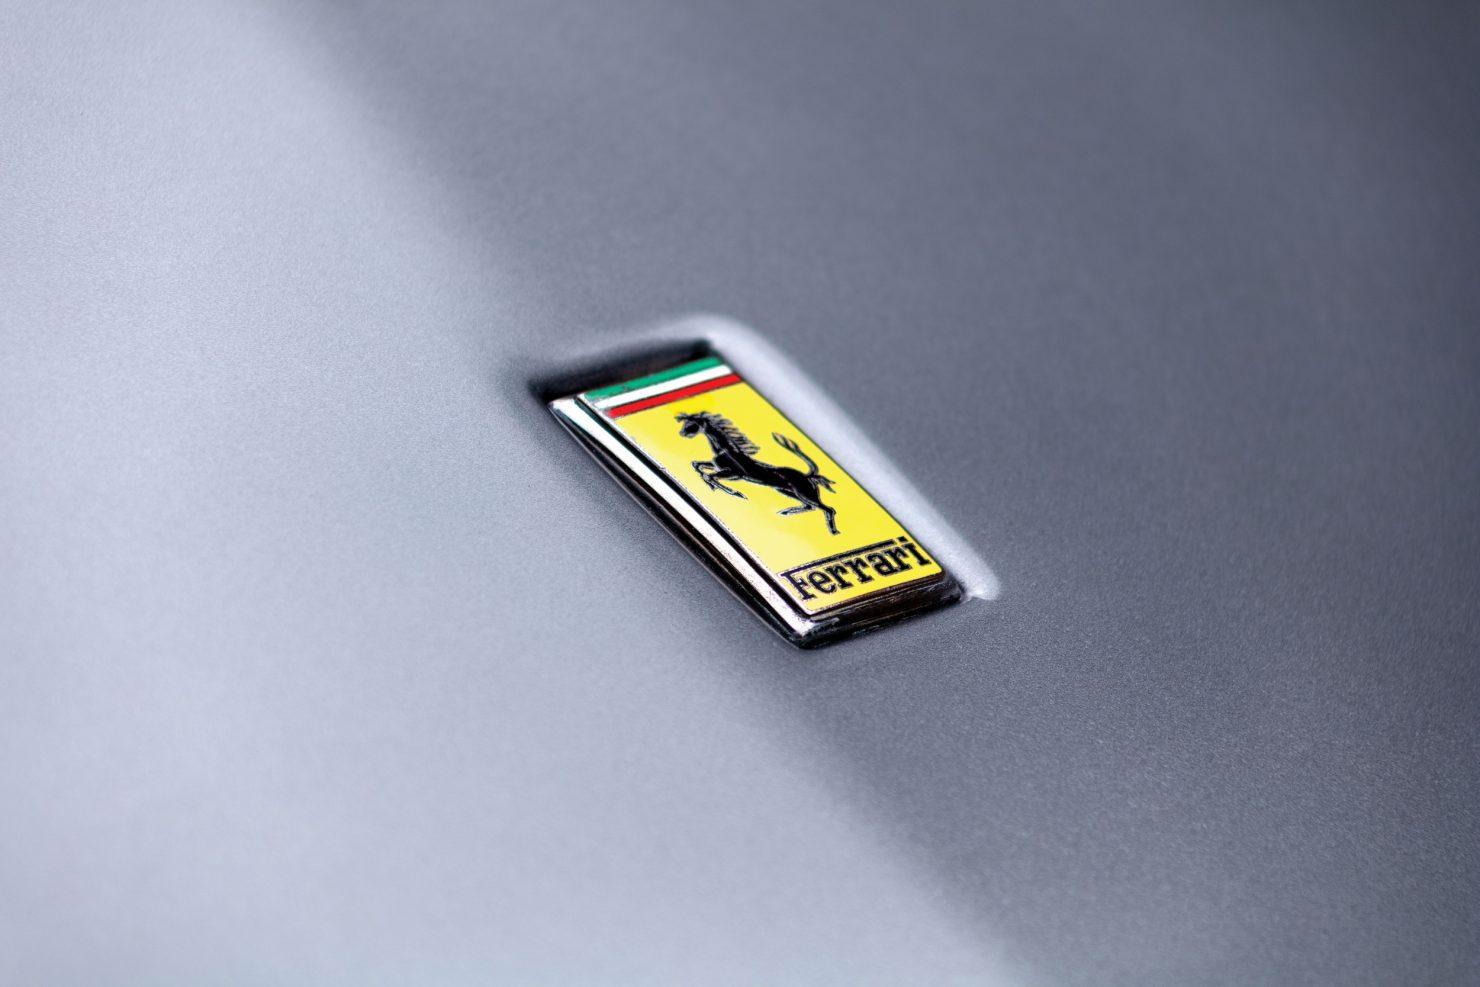 ferrari 275 gtb car 6 1480x987 - 1965 Ferrari 275 GTB/6C Alloy